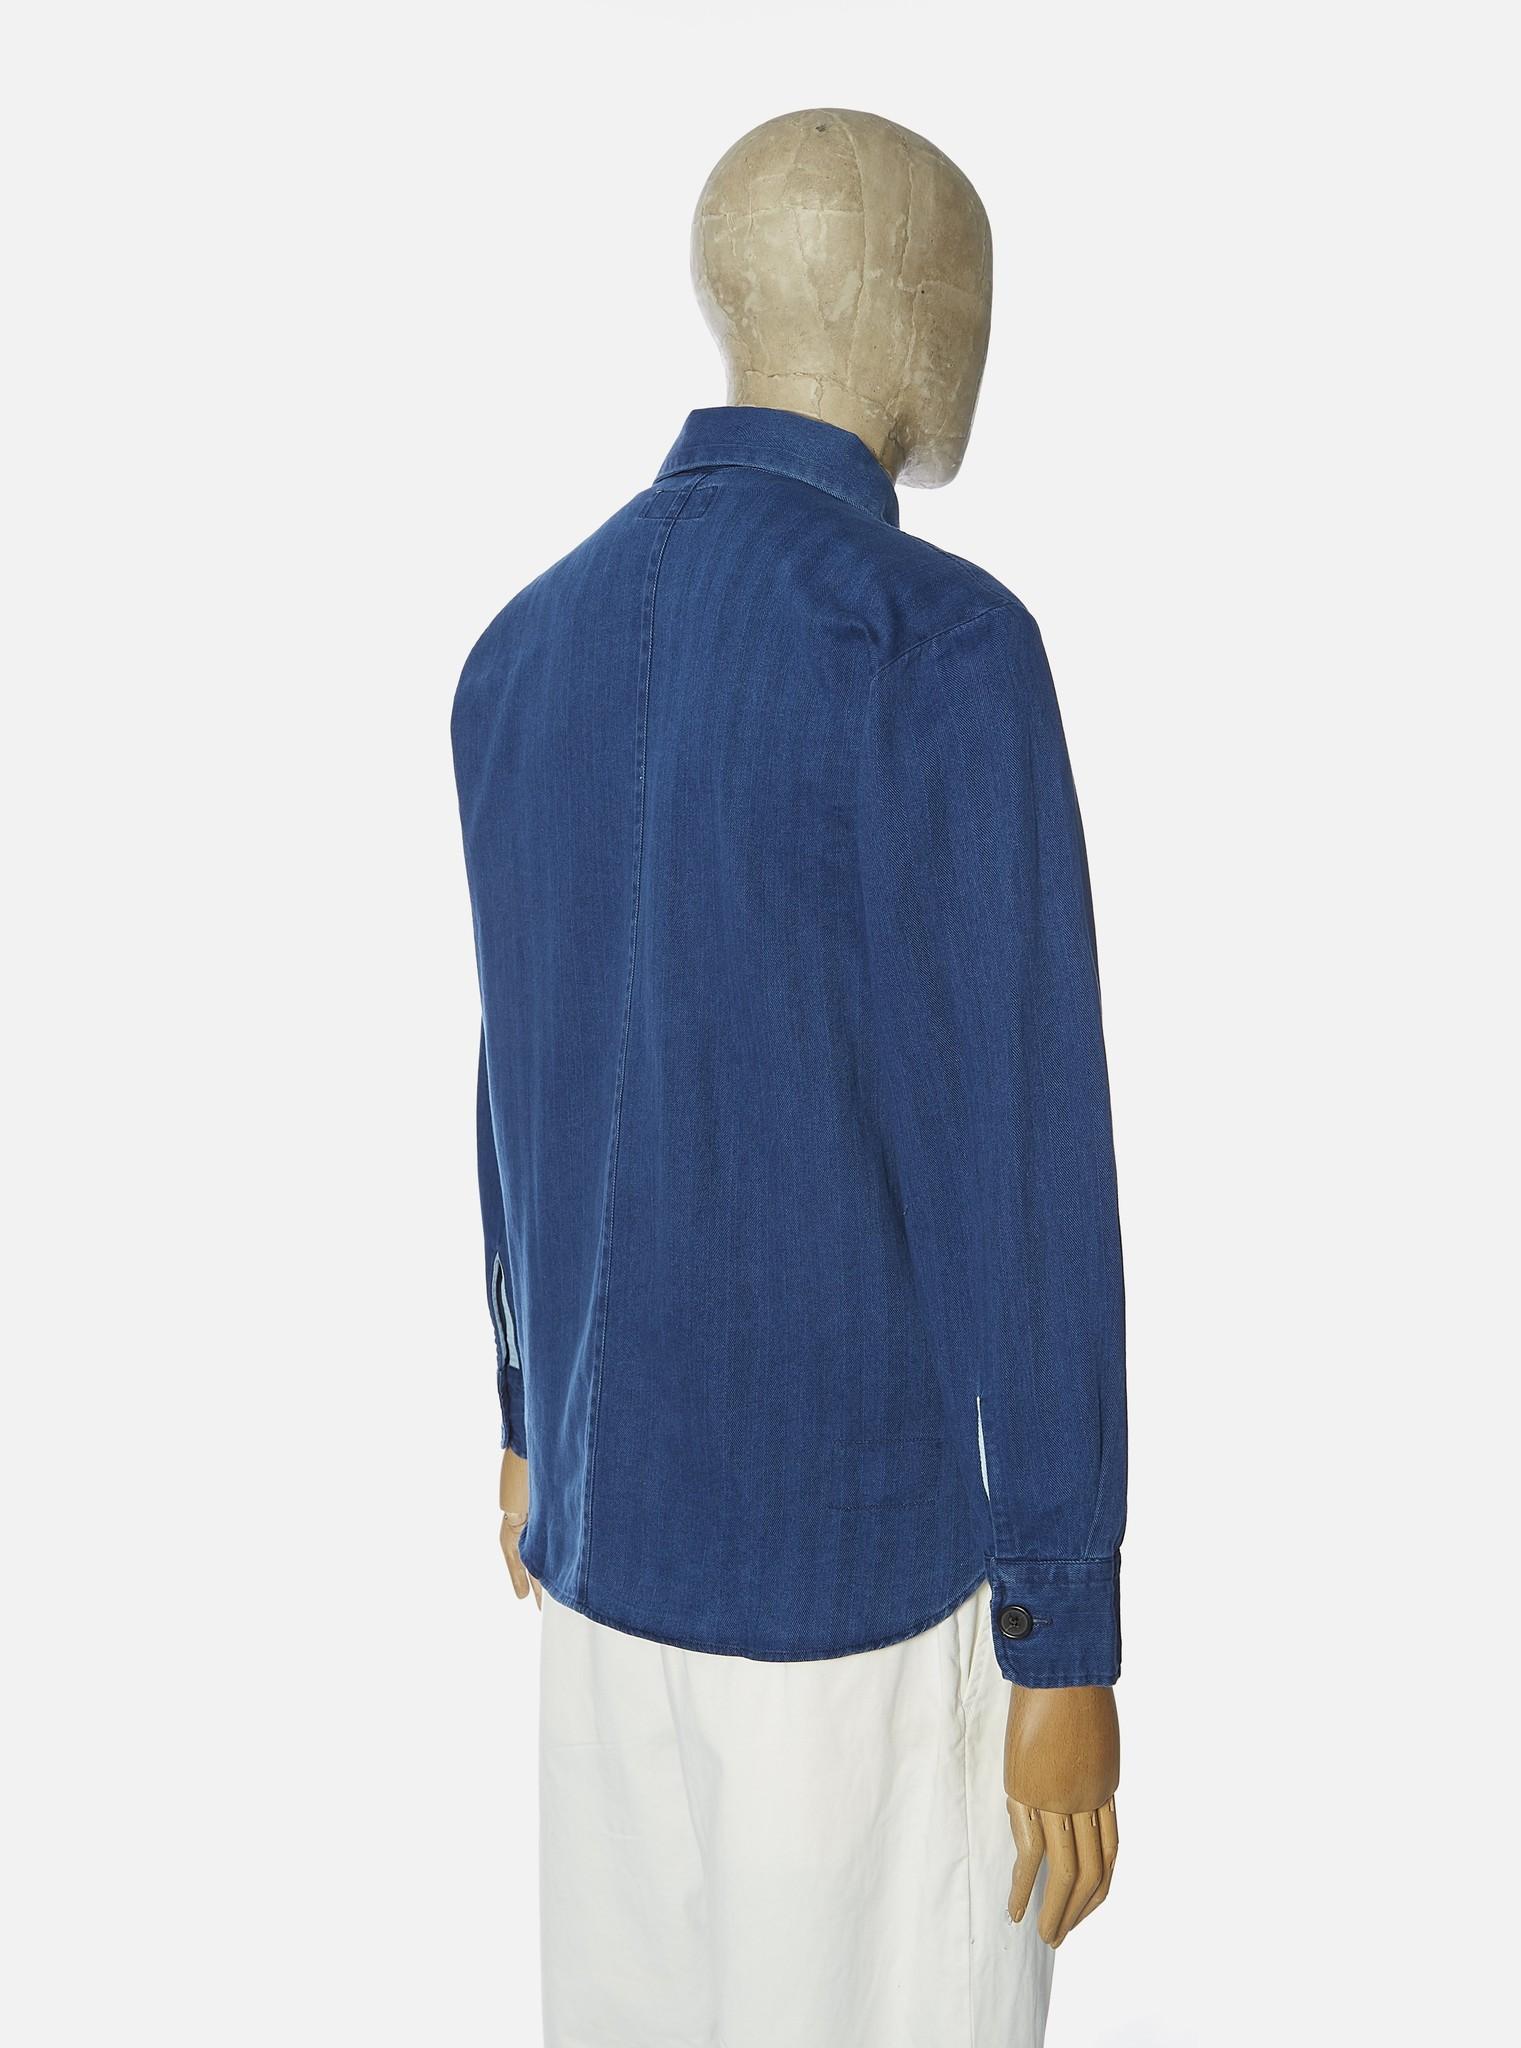 Travail Blue Shirt Washed Indigo-2